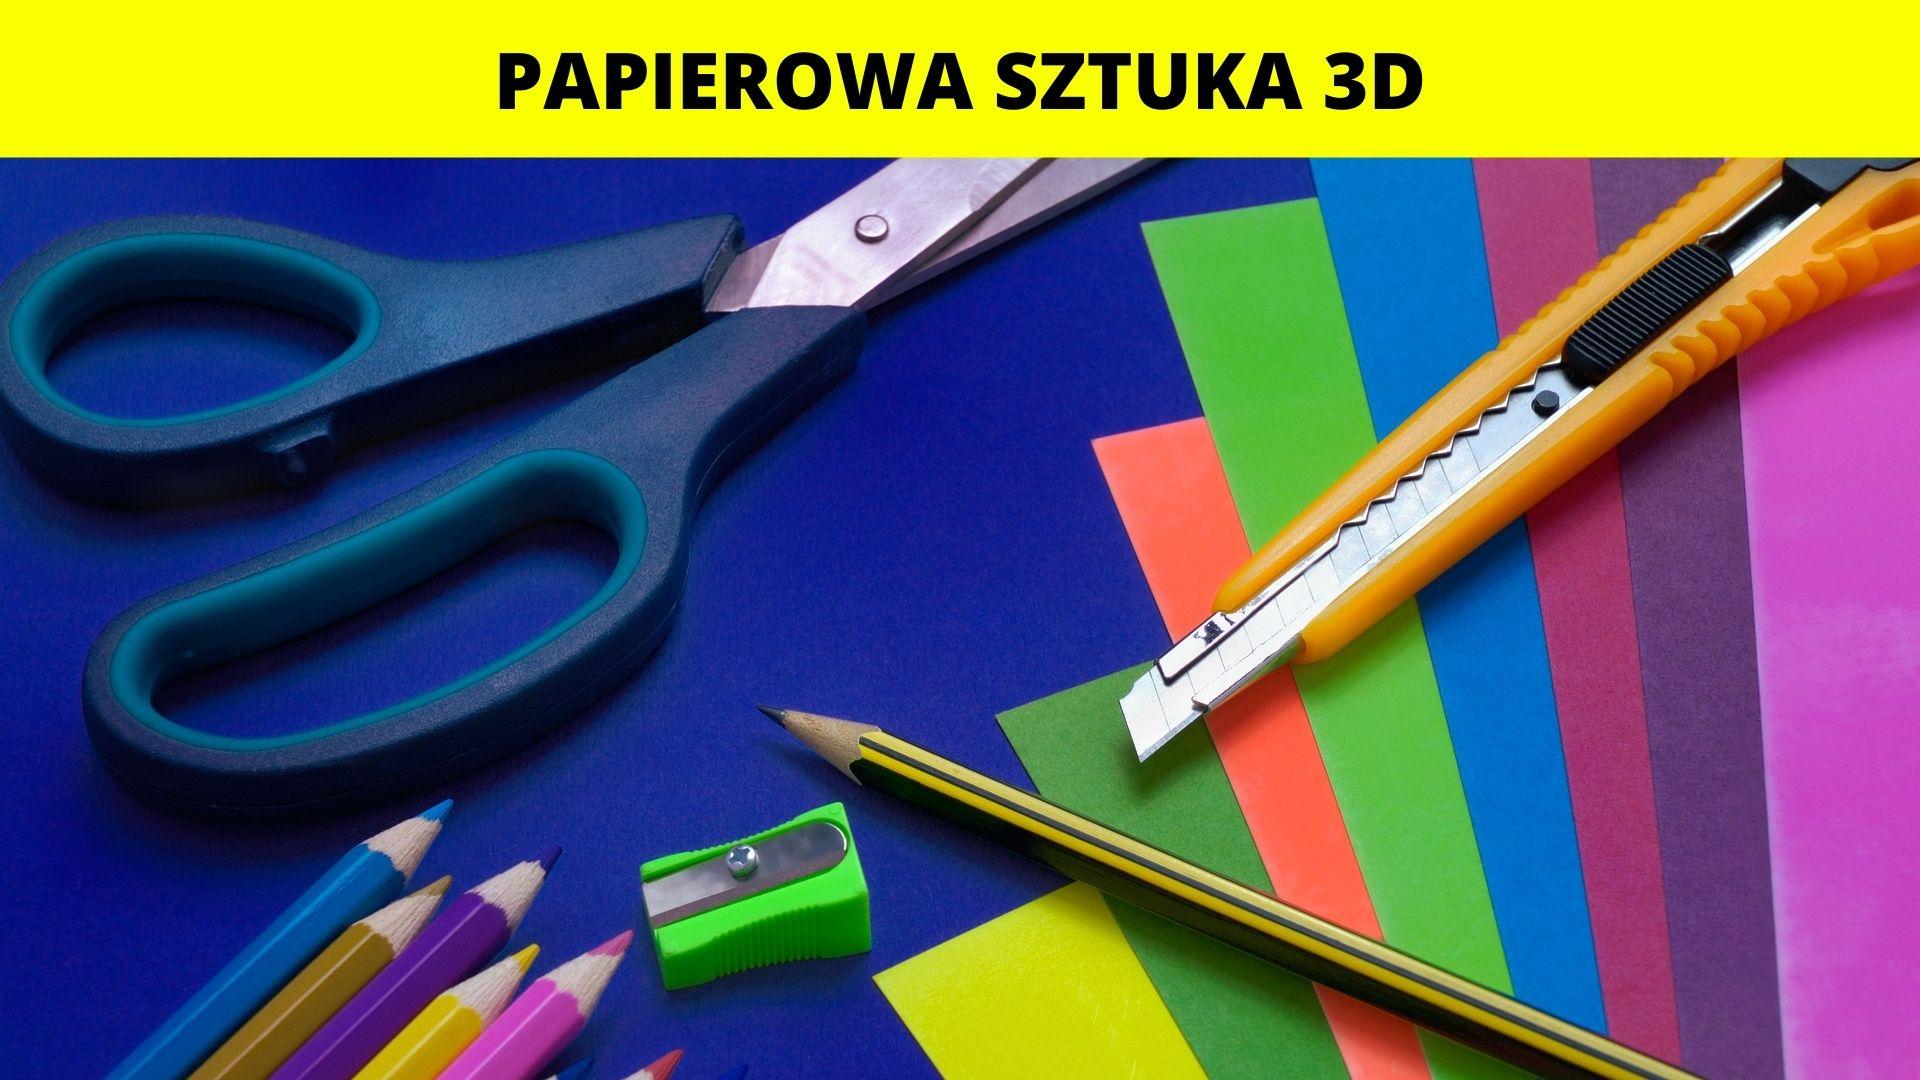 Sztuka papierowa 3D - warsztaty